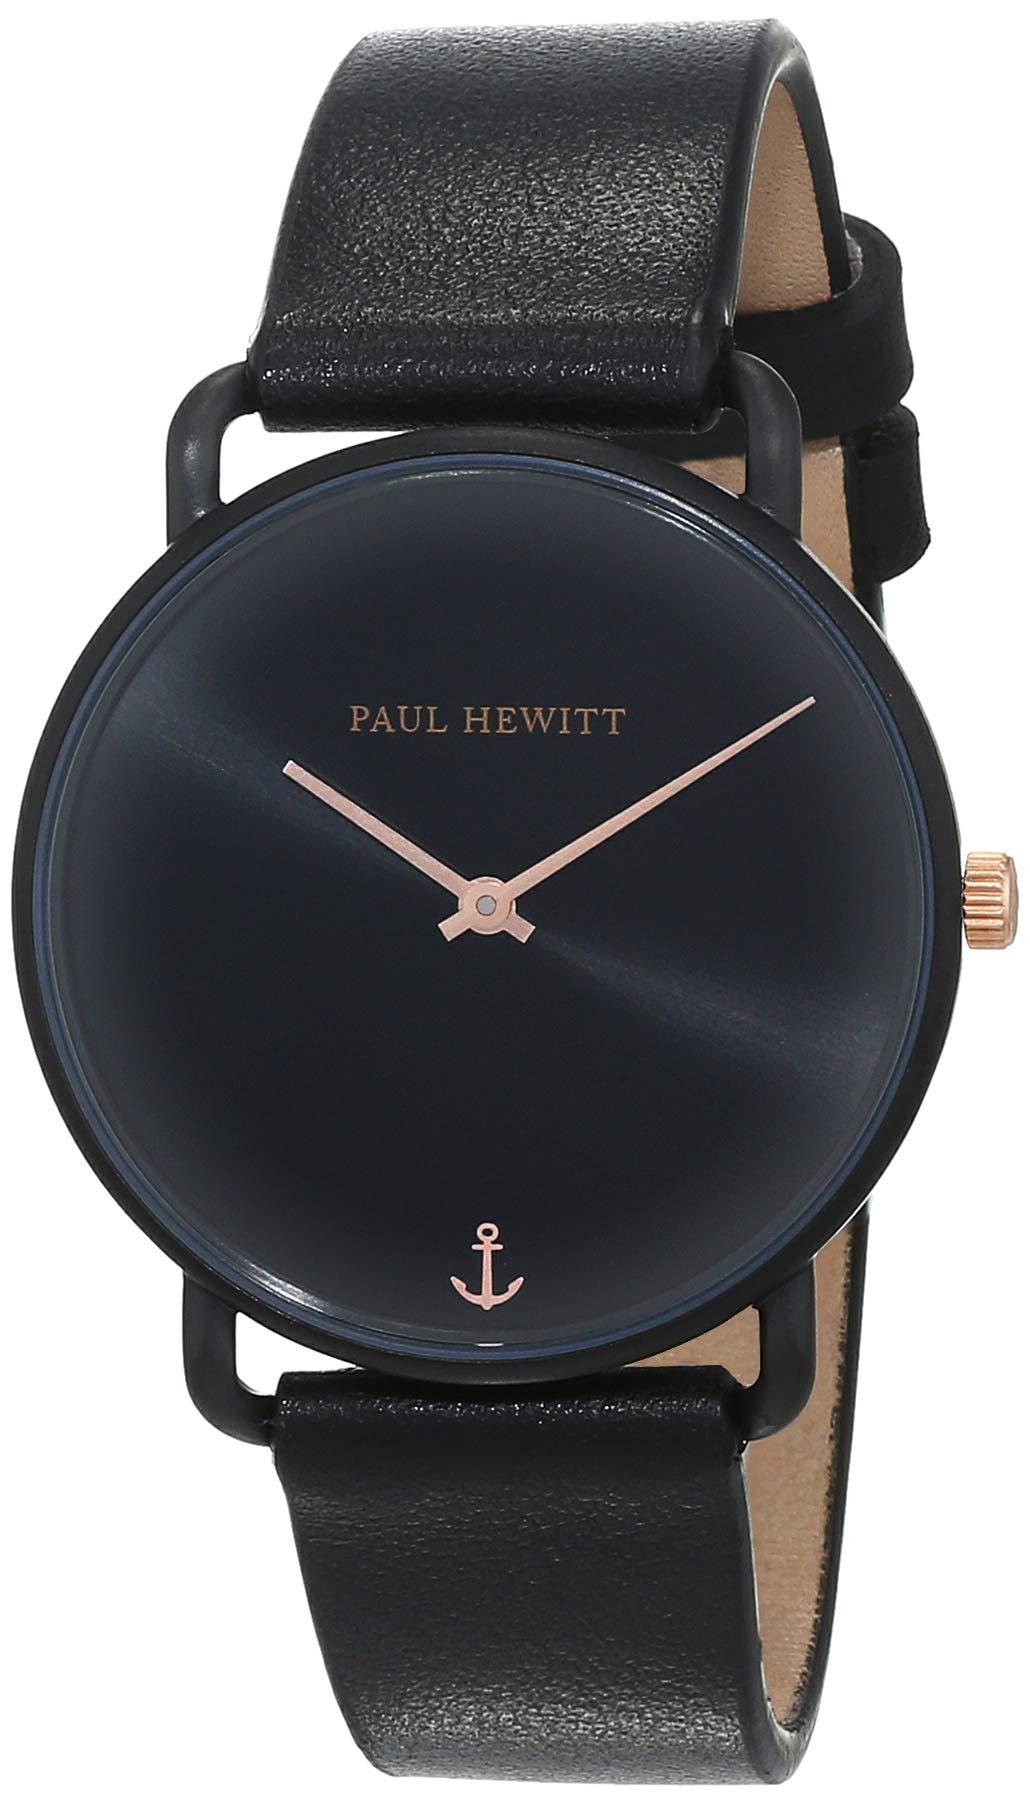 Armbanduhr Damen Miss Ocean Black Sunray - Damen Uhr (Schwarz), schwarzes Ziffernblatt